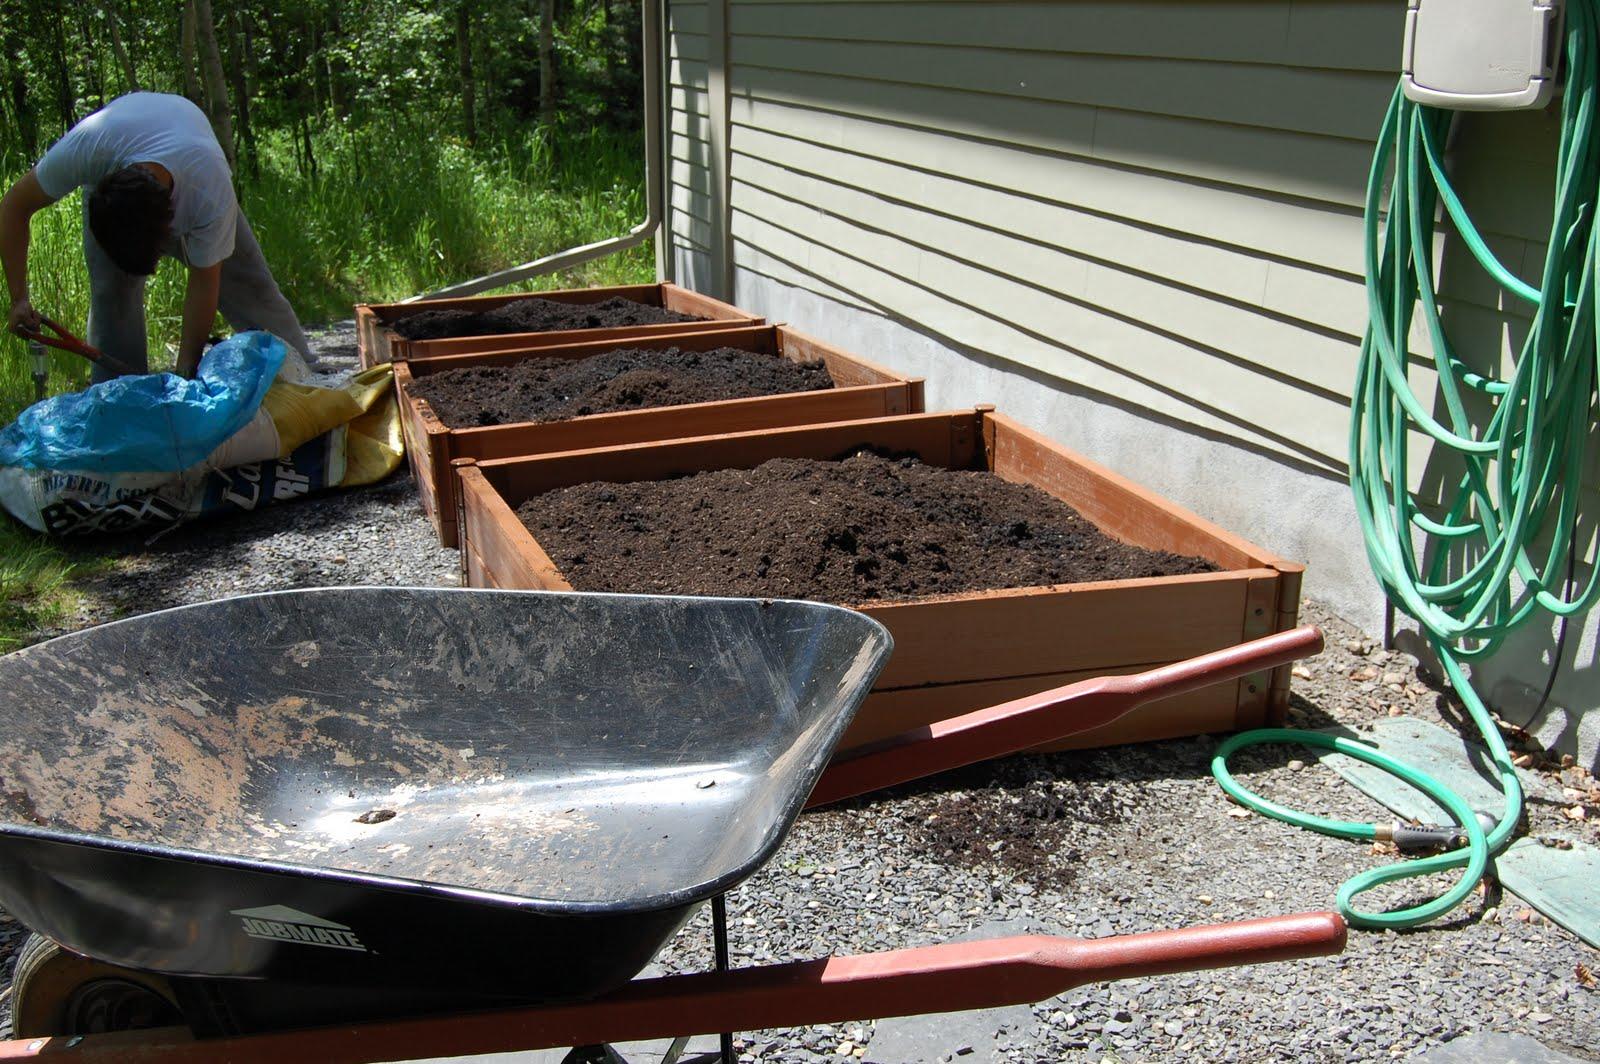 Kid Calgary My Vegetable Garden Planting The Seeds